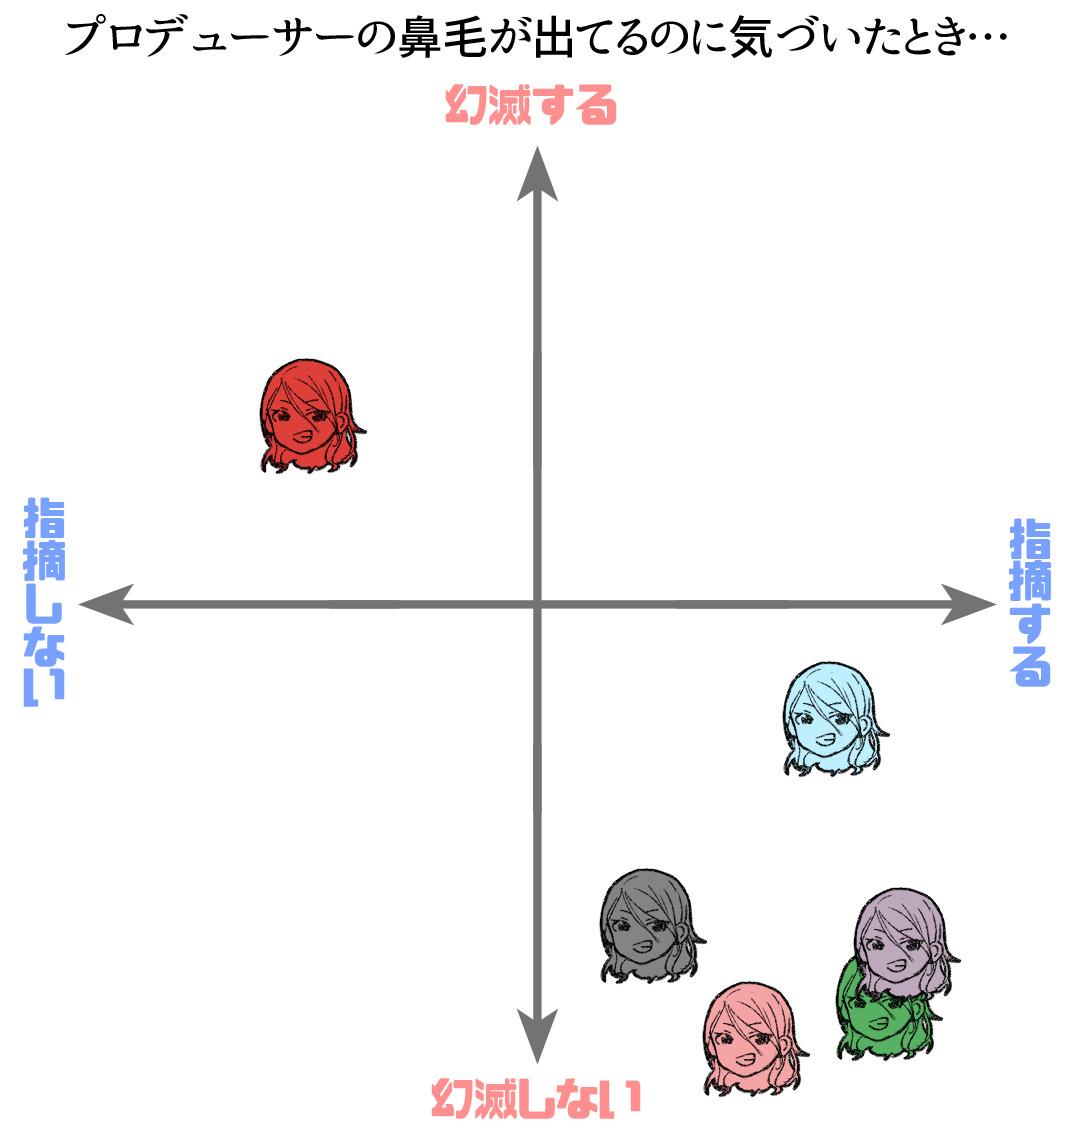 f:id:hoshi_sano:20200414113728j:image:w400